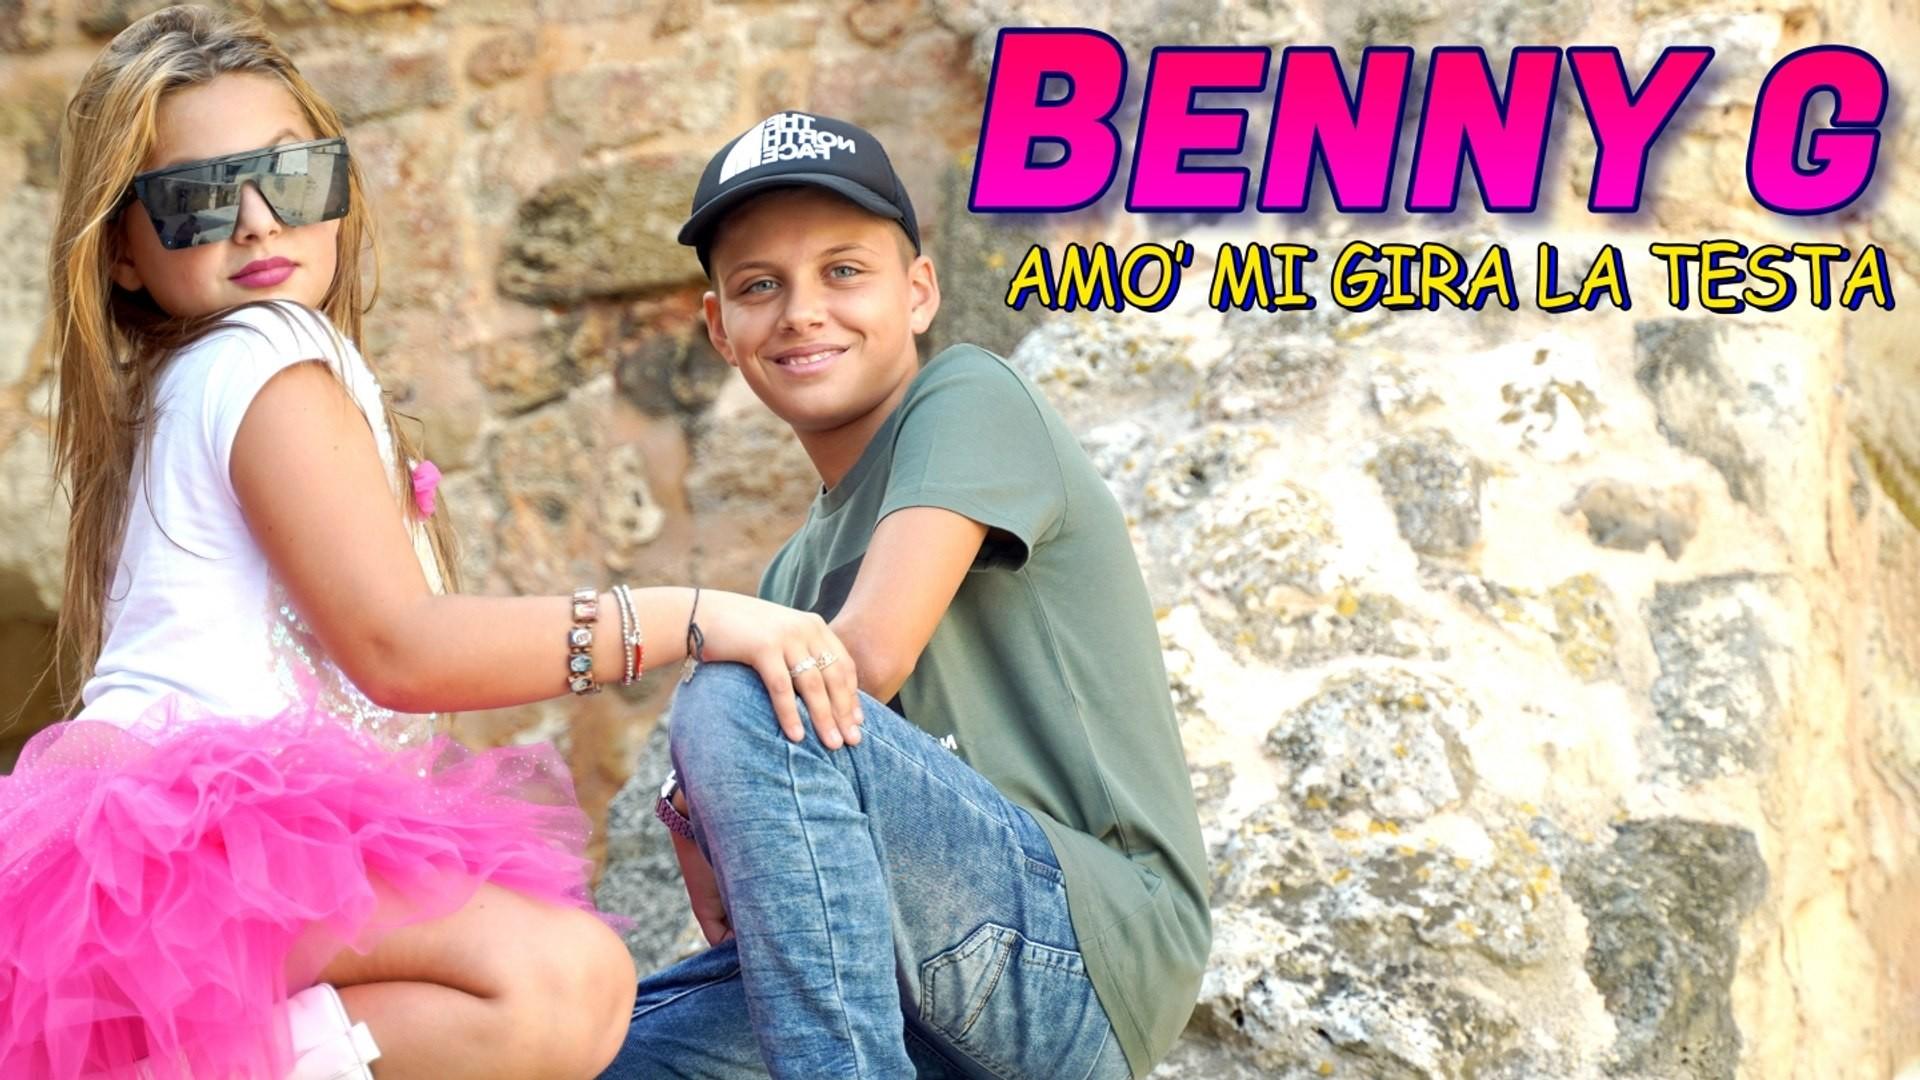 Benny G - Amo' mi gira la testa (Ufficiale 2020) - Video Dailymotion